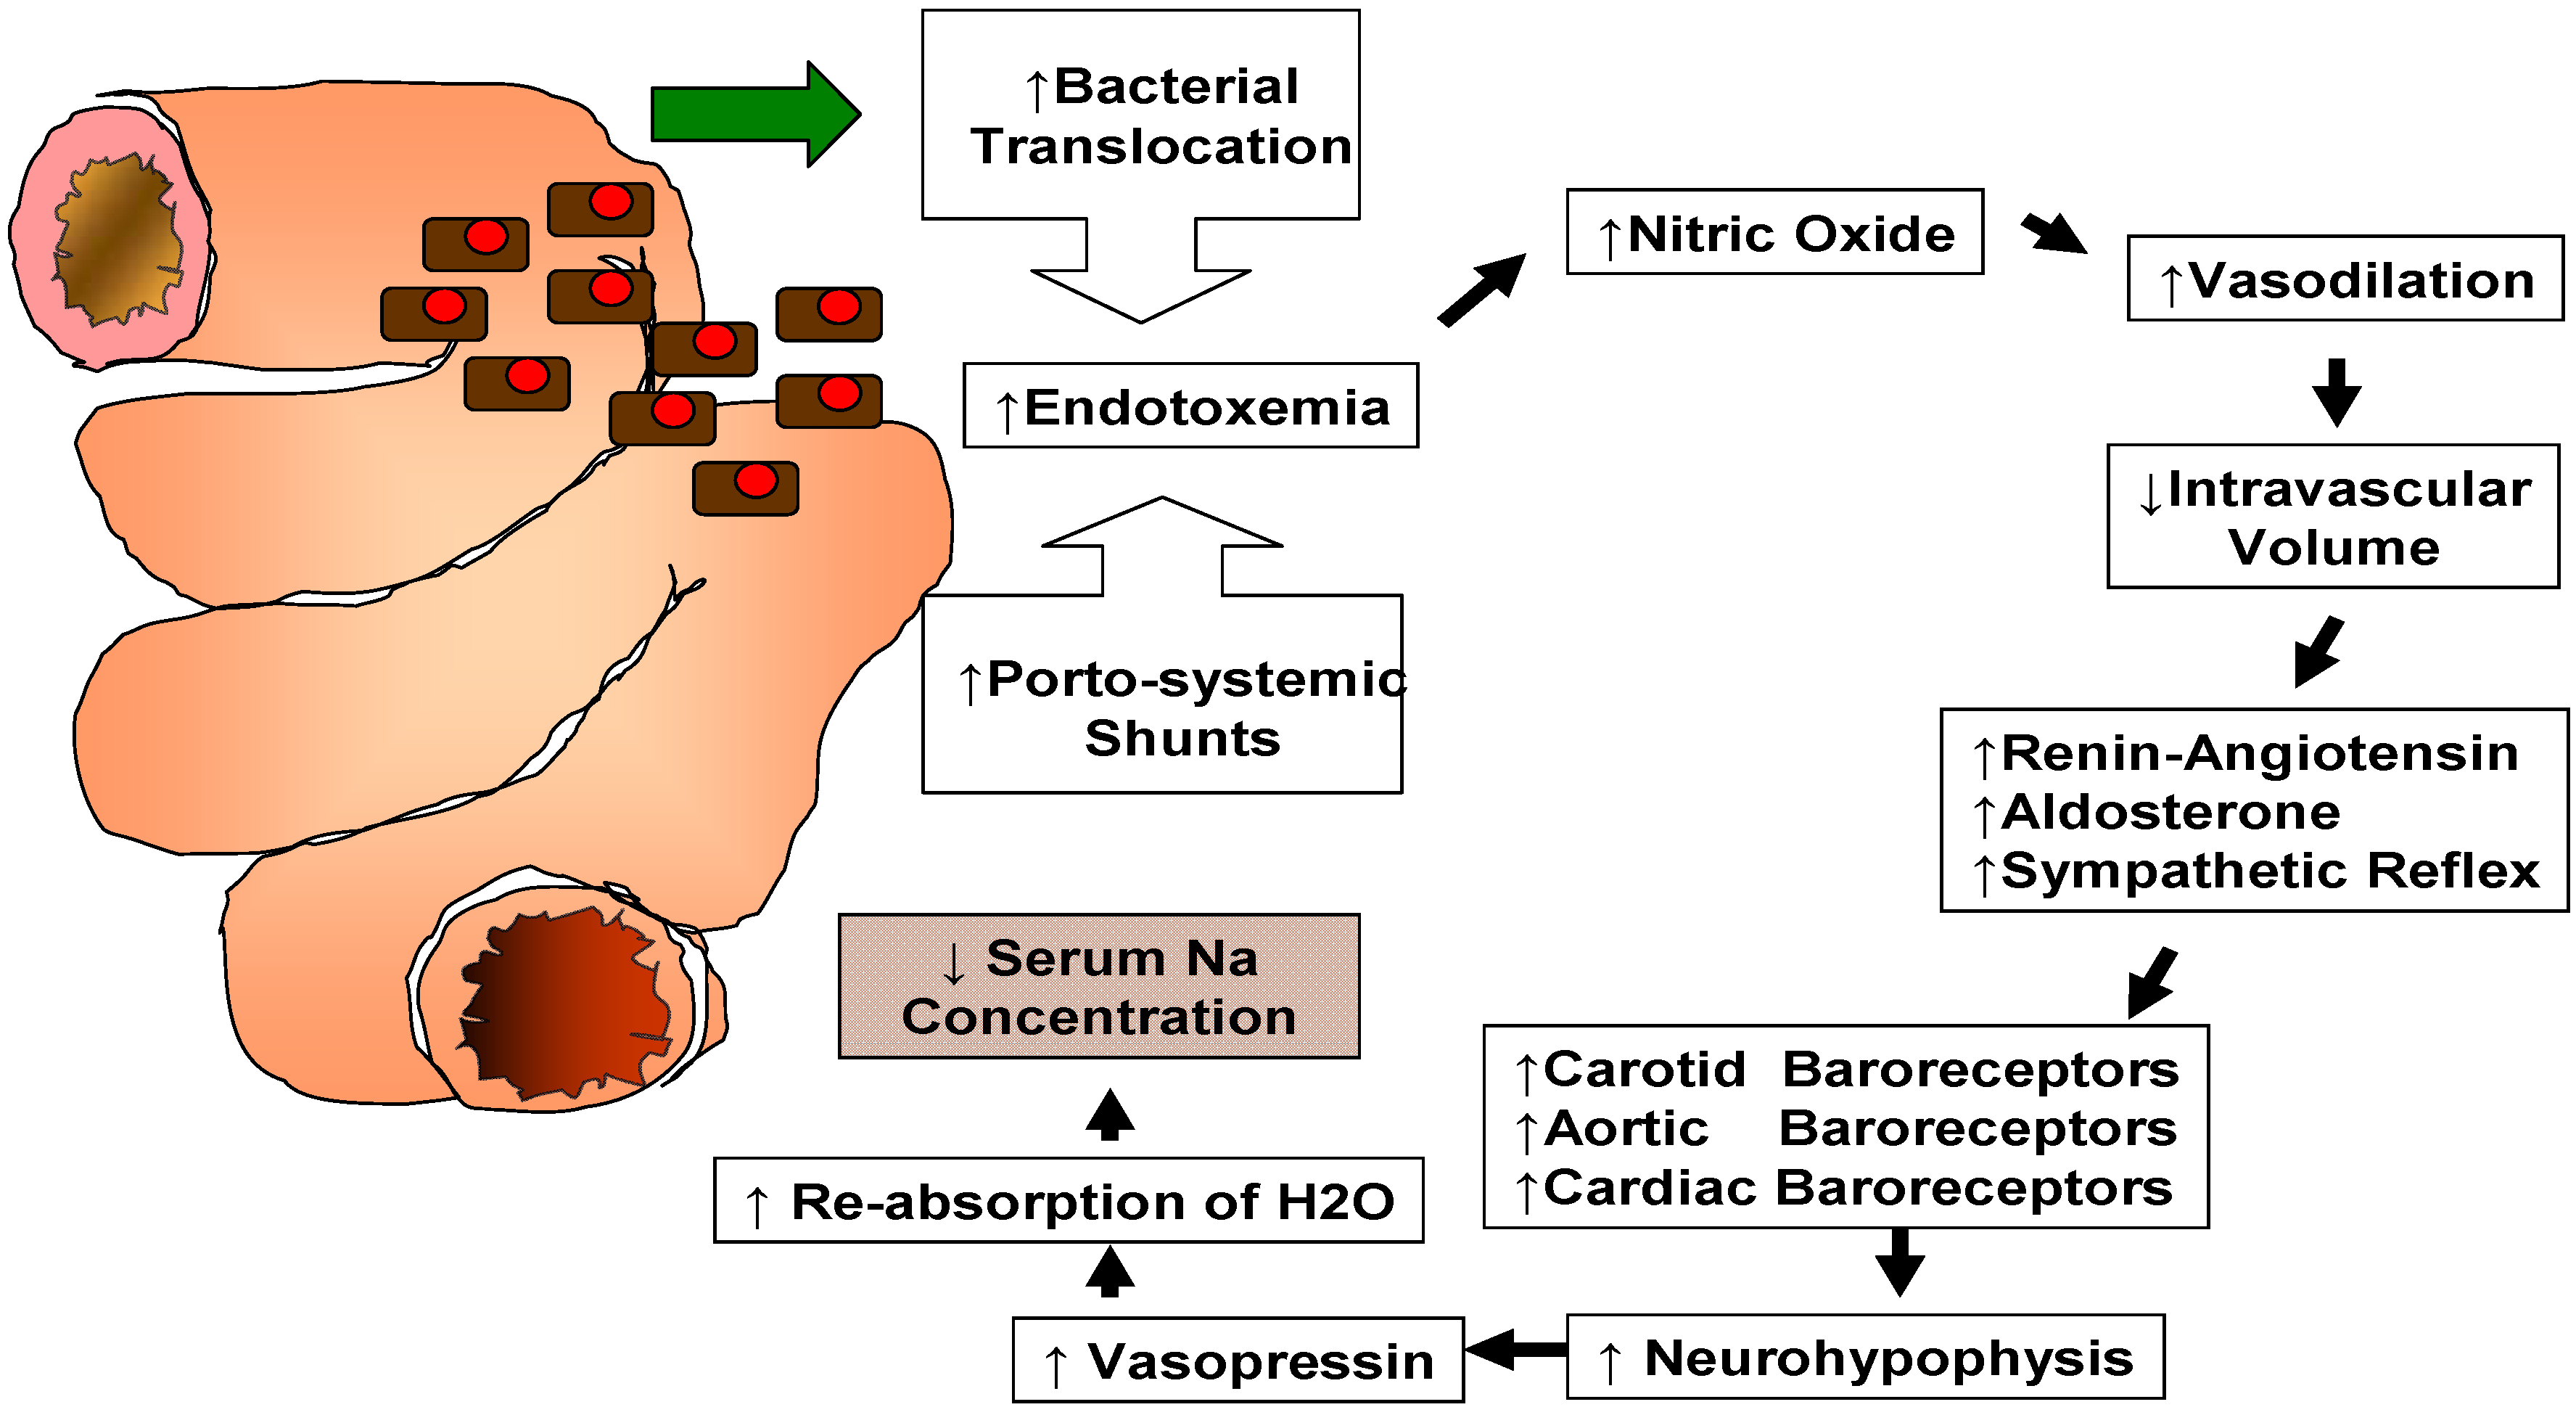 HYPONATREMIA PATHOPHYSIOLOGY EBOOK DOWNLOAD